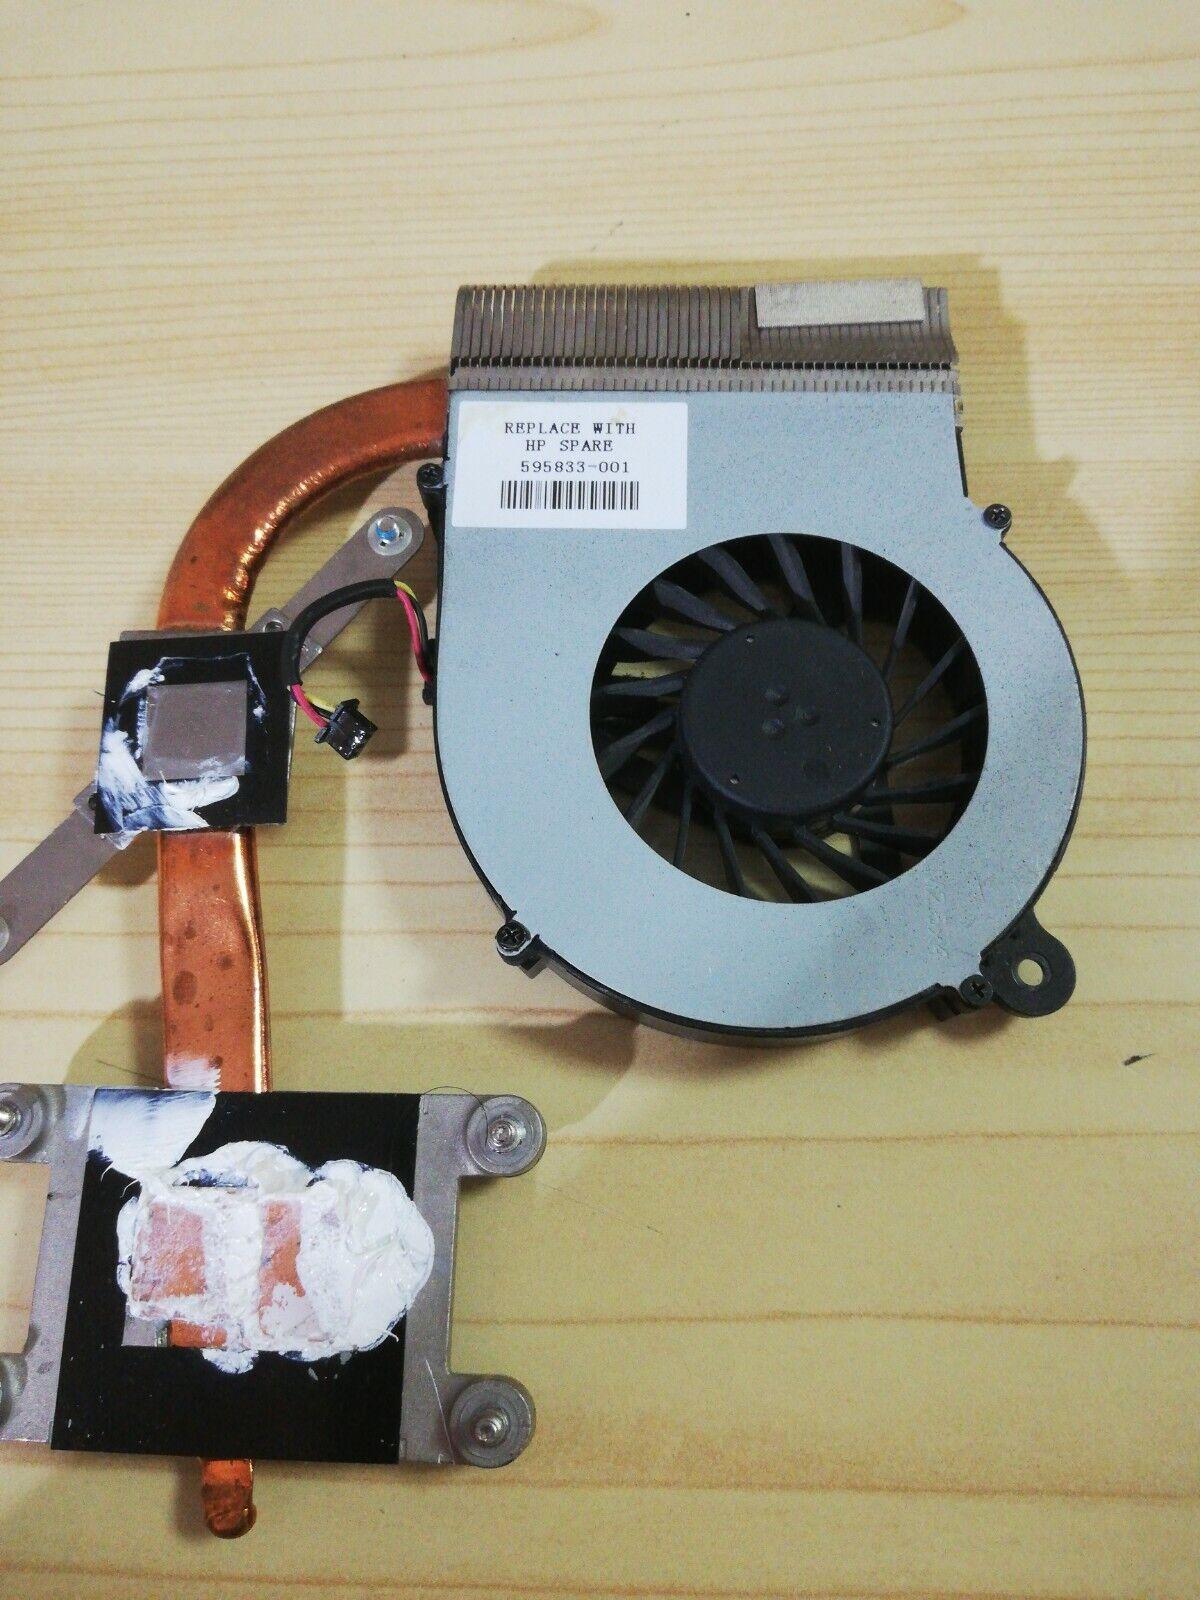 Fan + Heatsink Rob a3v 8p 1 for SIEMEMS amilo a1650g ms2174